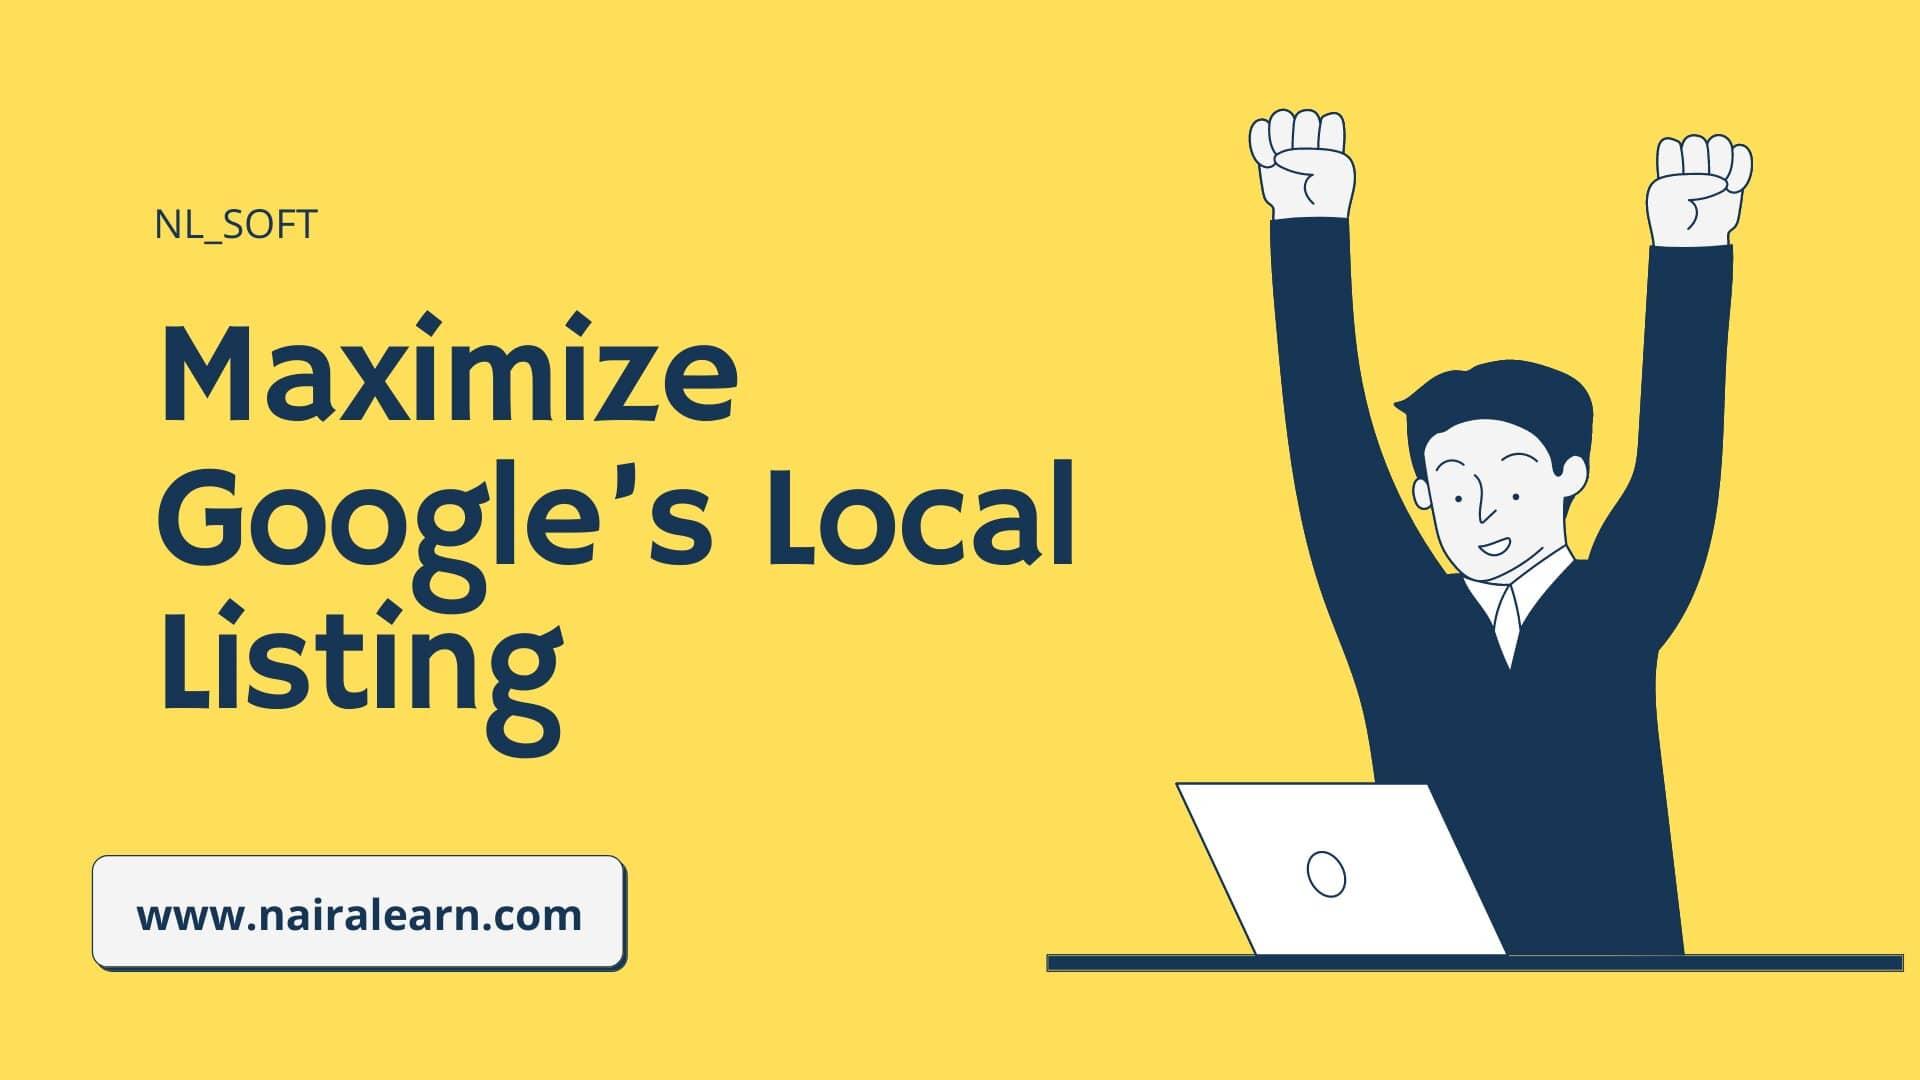 Maximize Google's Local Listing